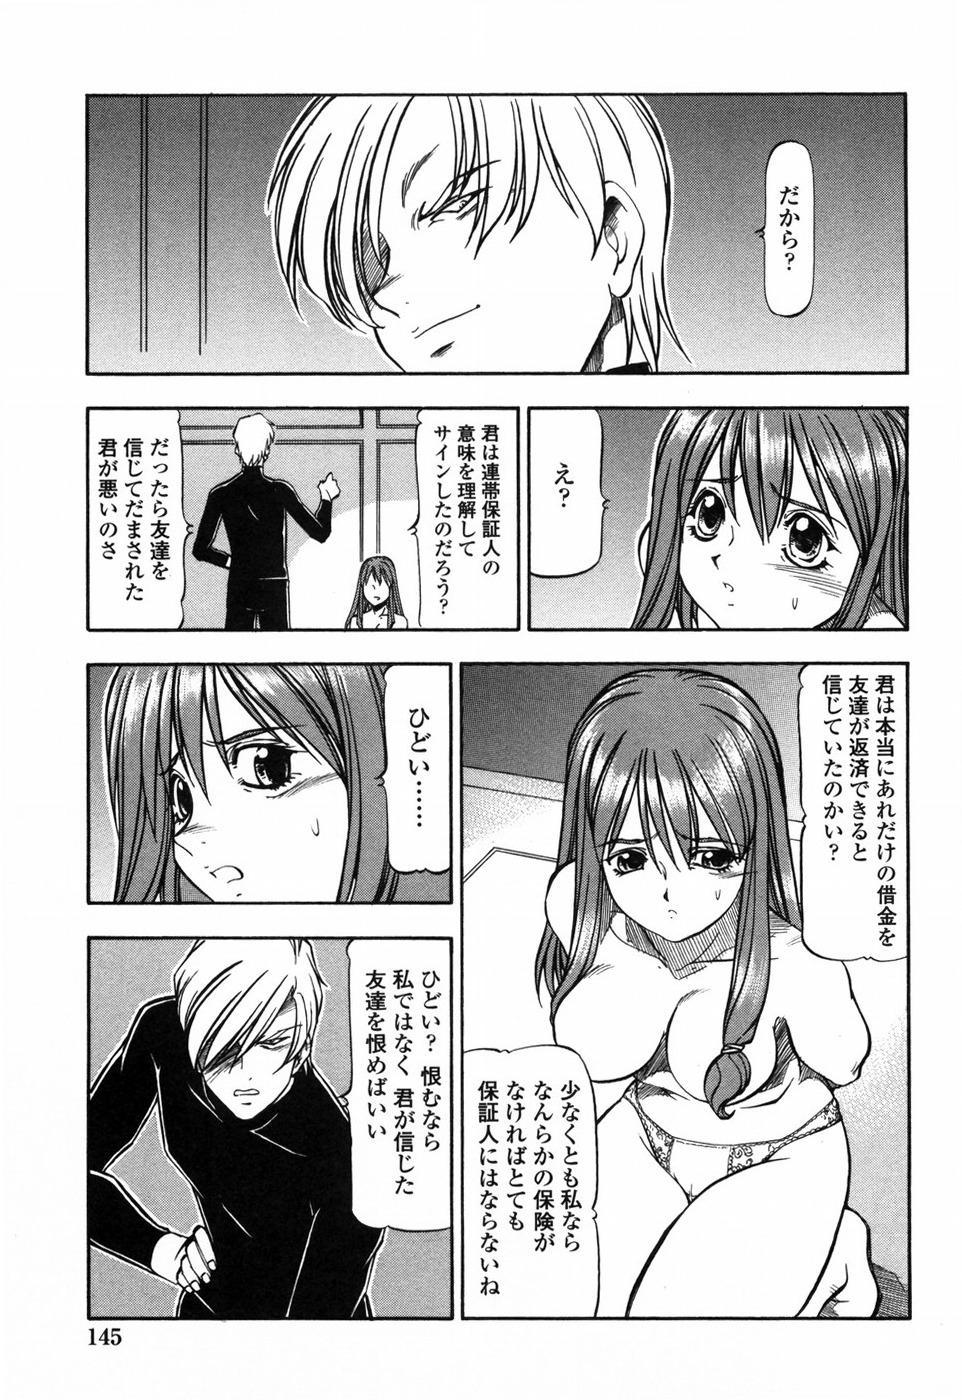 Kichiku Houteishiki - Equation of brutal person 151